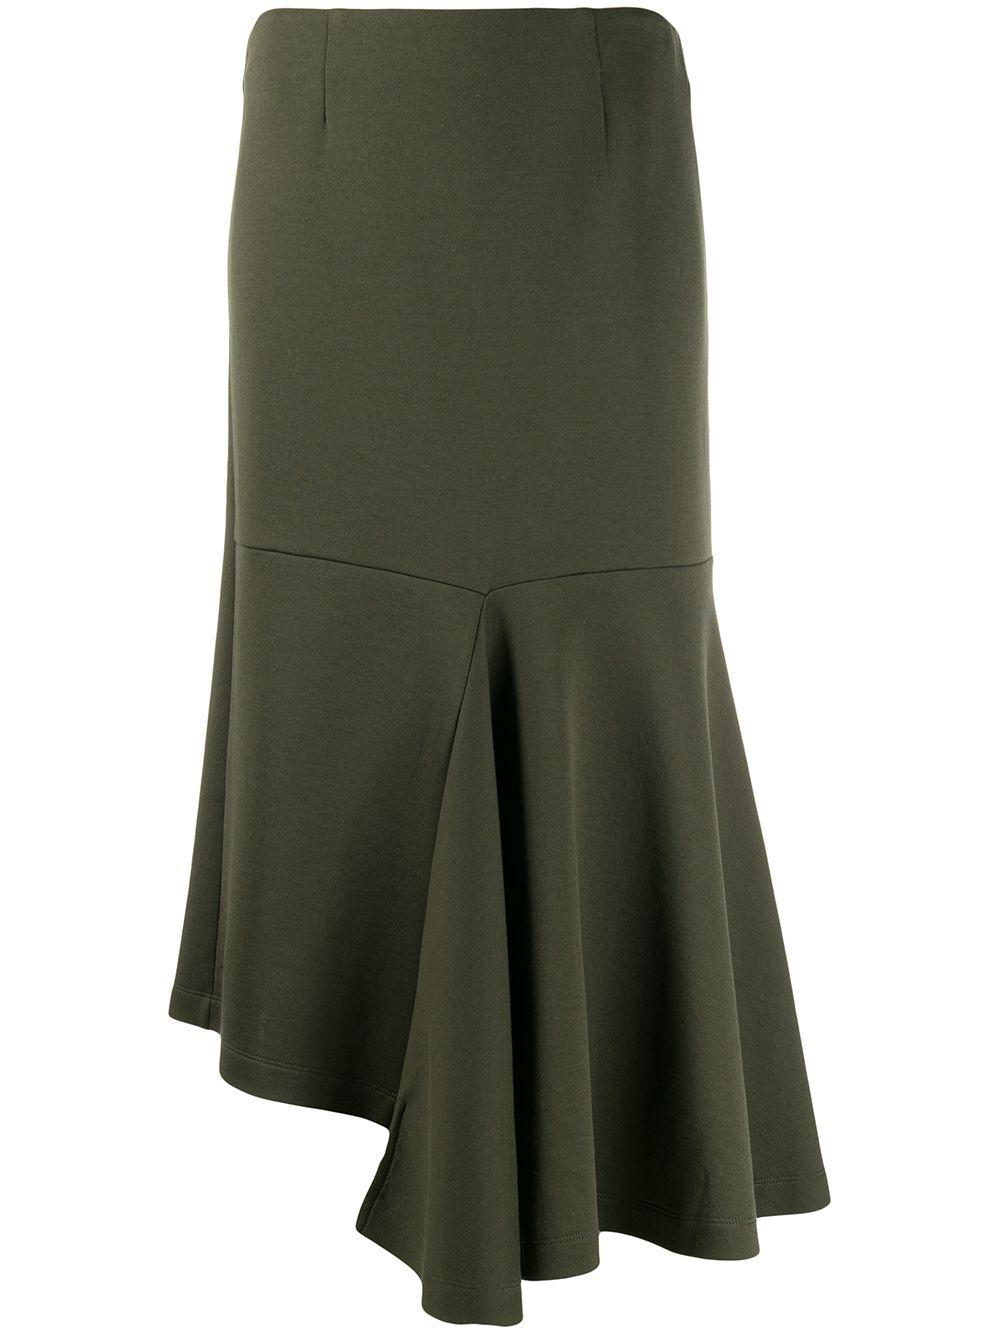 Marni юбка миди асимметричного кроя с драпировкой